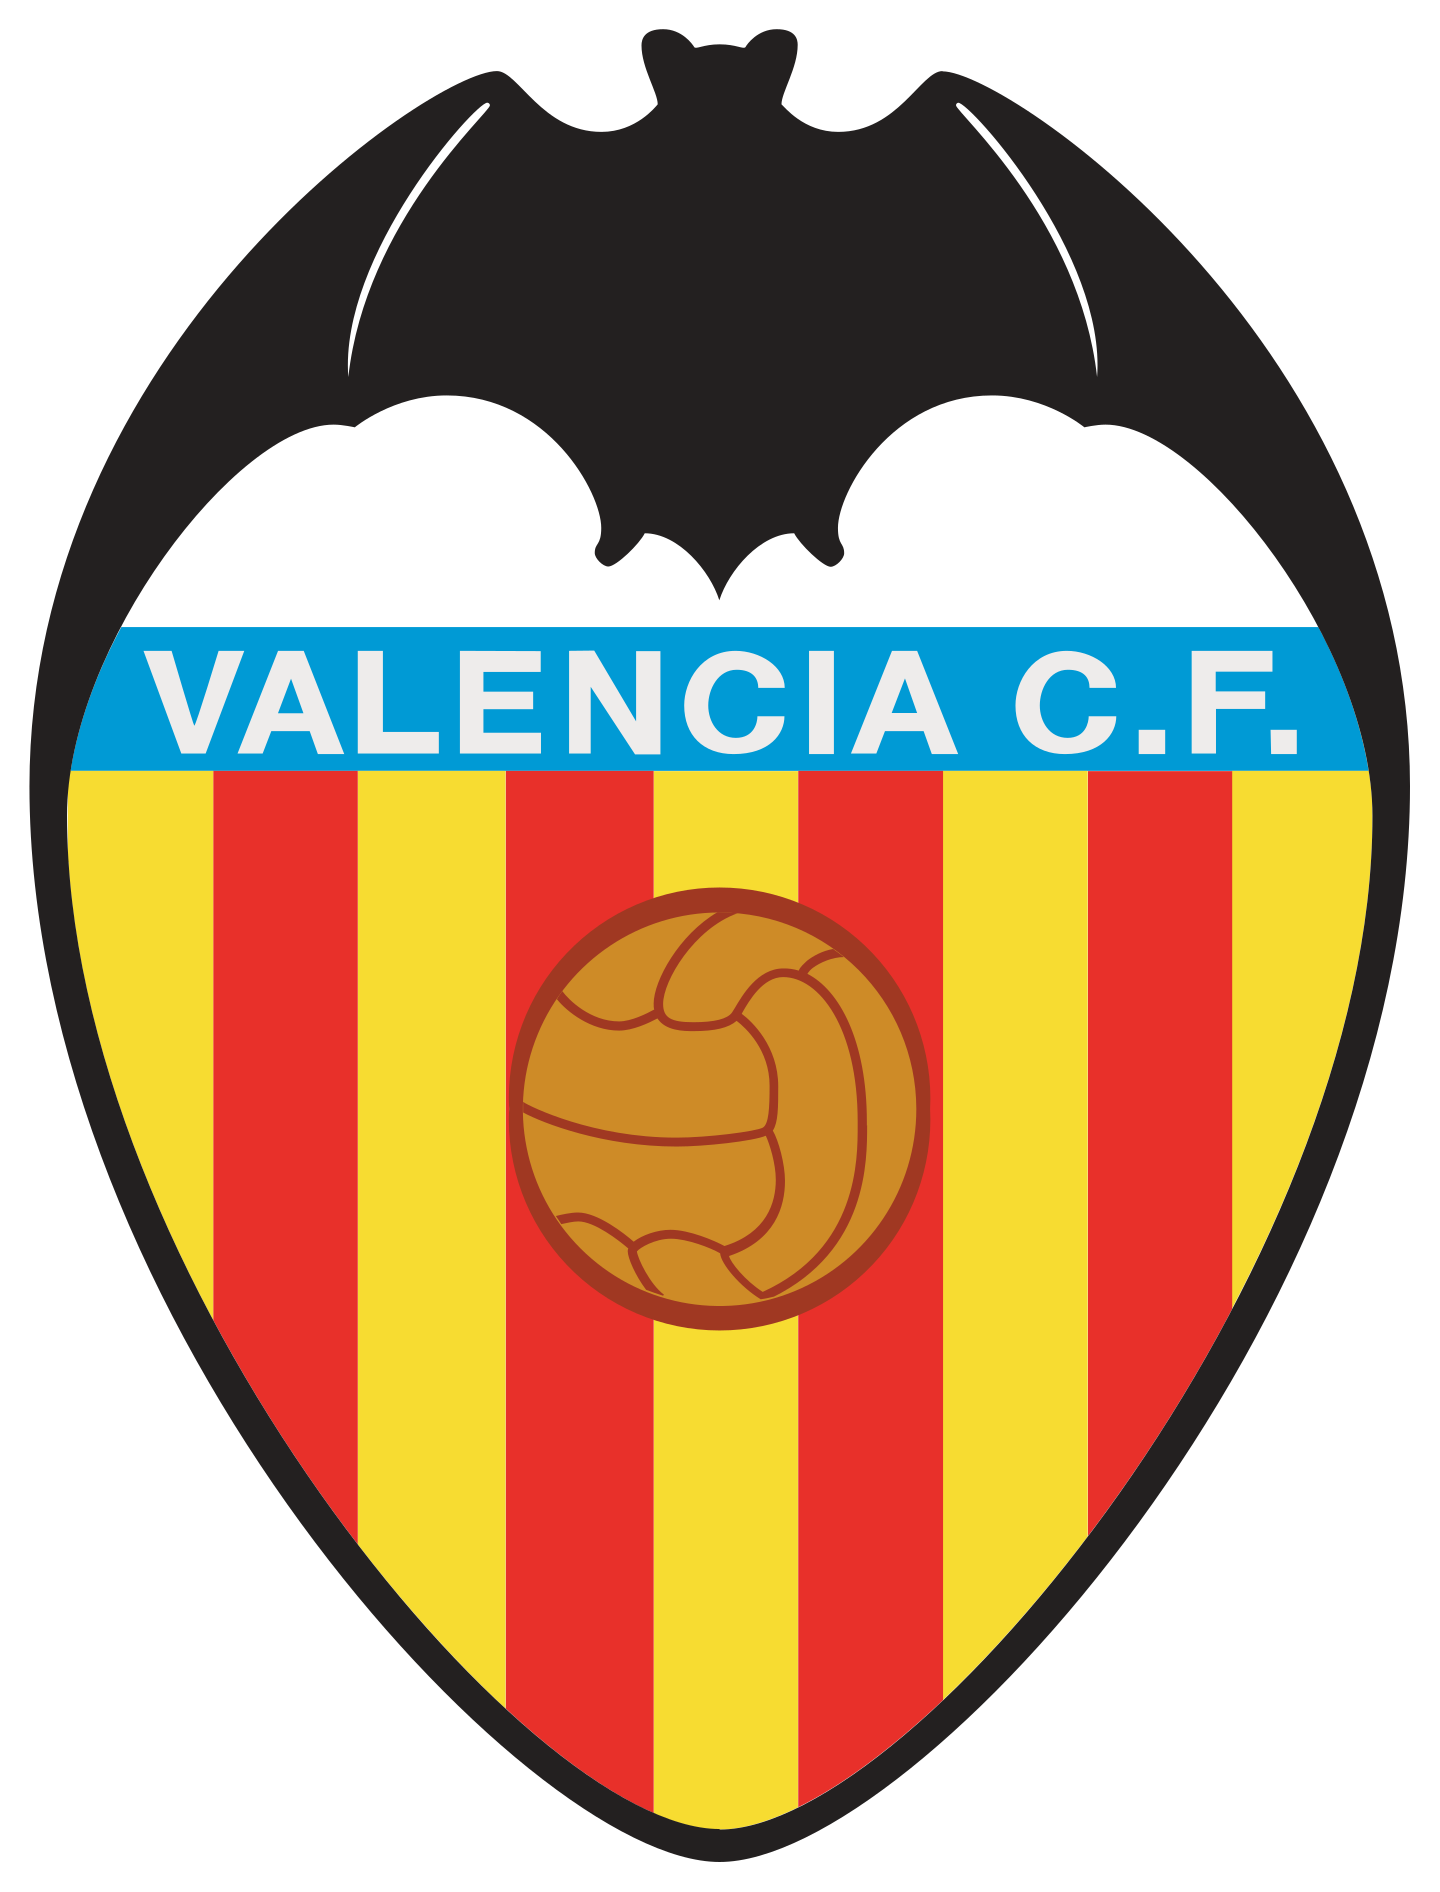 valencia cf logo escudo 2 - Valencia CF Logo – Escudo